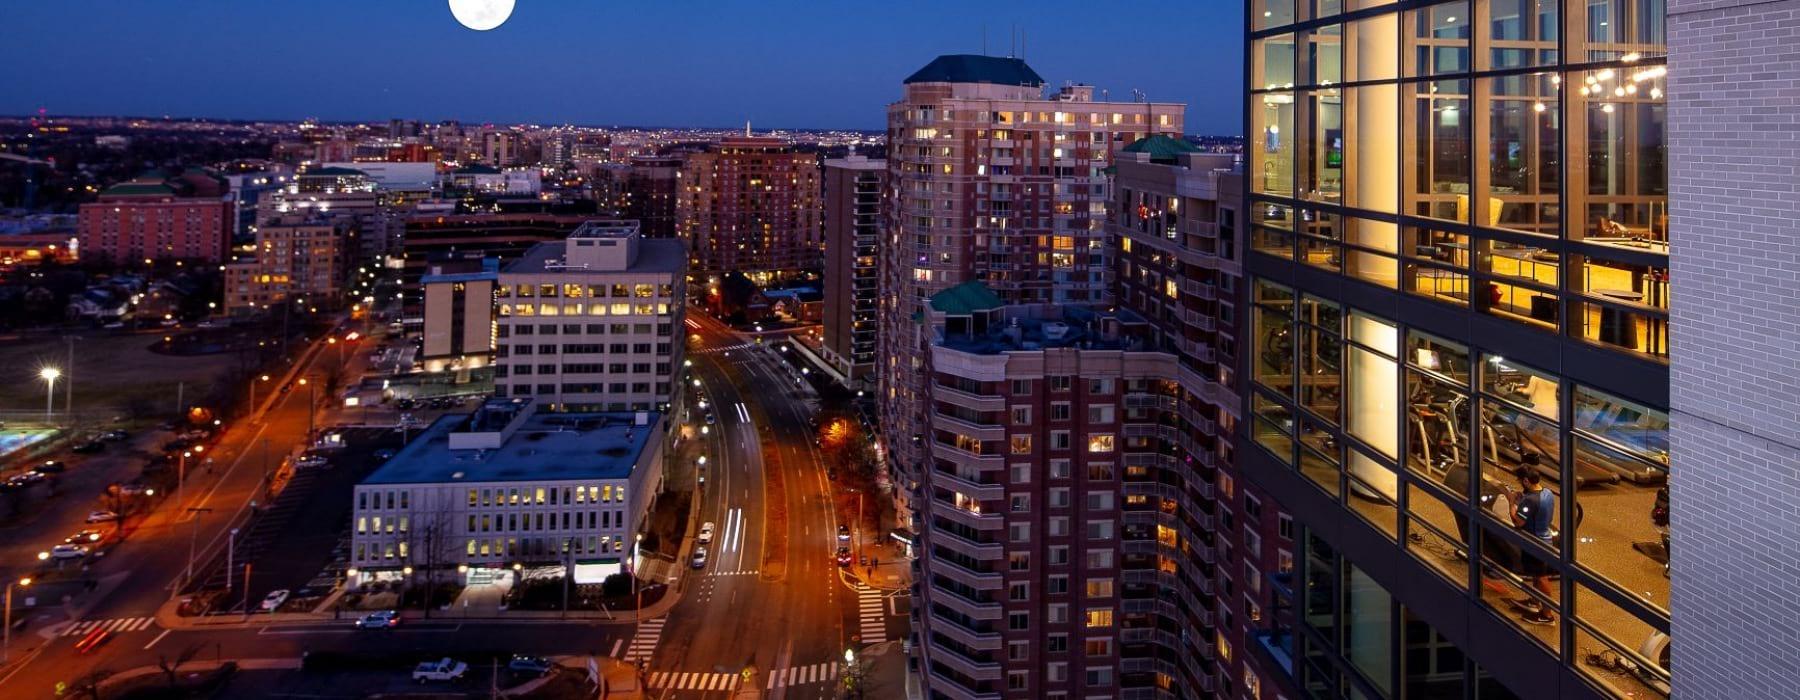 view from rooftop at night - j sol apartments ballston arlington virginia